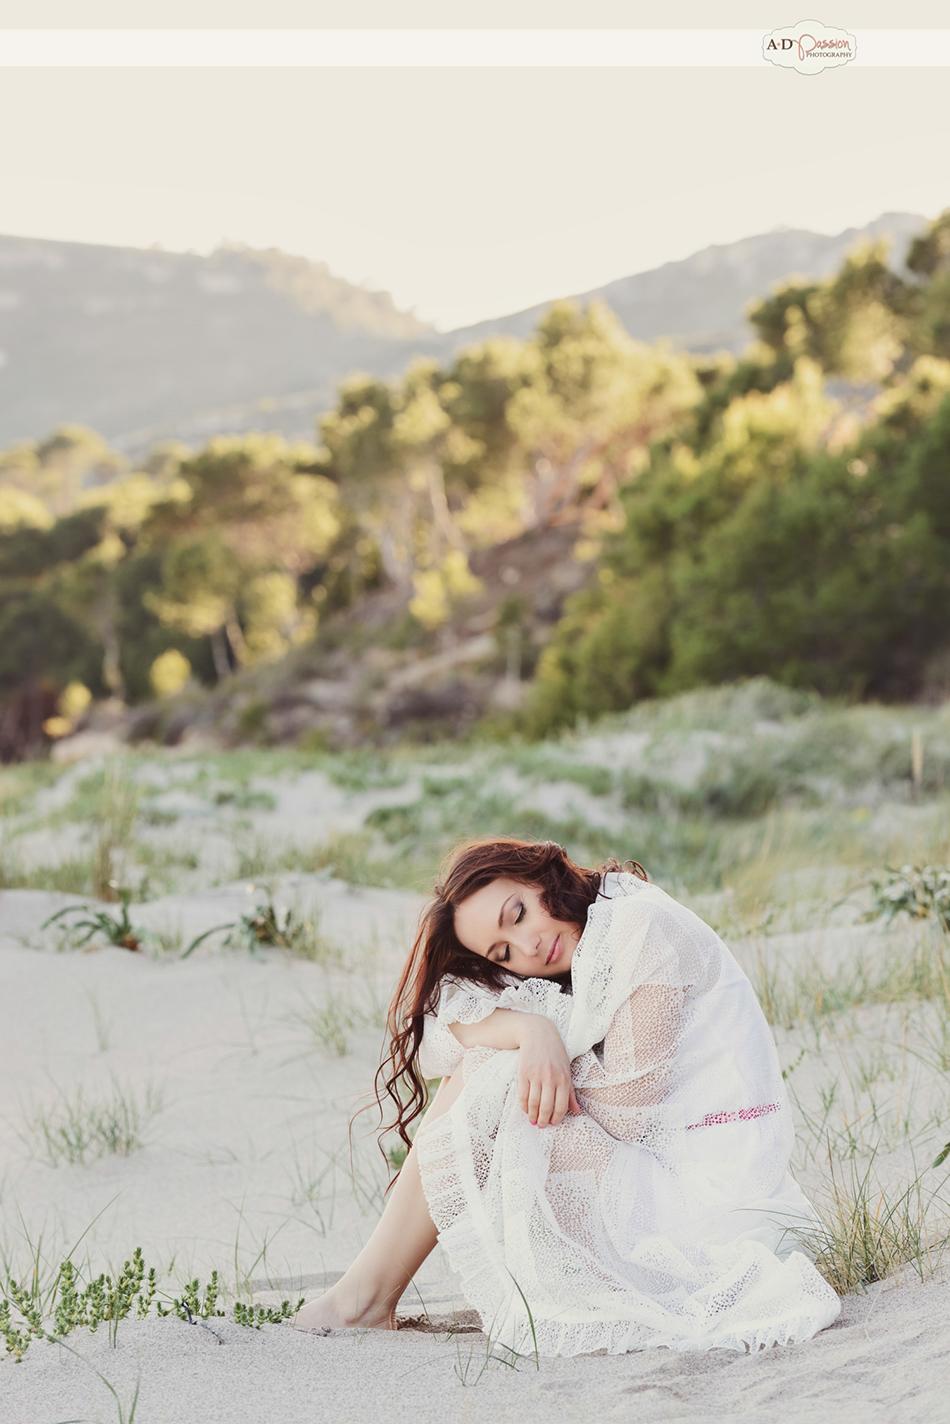 AD Passion Photography | fotograf-profesionist-nunta-sedinta-foto-la-mare_barcelona_0036 | Adelin, Dida, fotograf profesionist, fotograf de nunta, fotografie de nunta, fotograf Timisoara, fotograf Craiova, fotograf Bucuresti, fotograf Arad, nunta Timisoara, nunta Arad, nunta Bucuresti, nunta Craiova